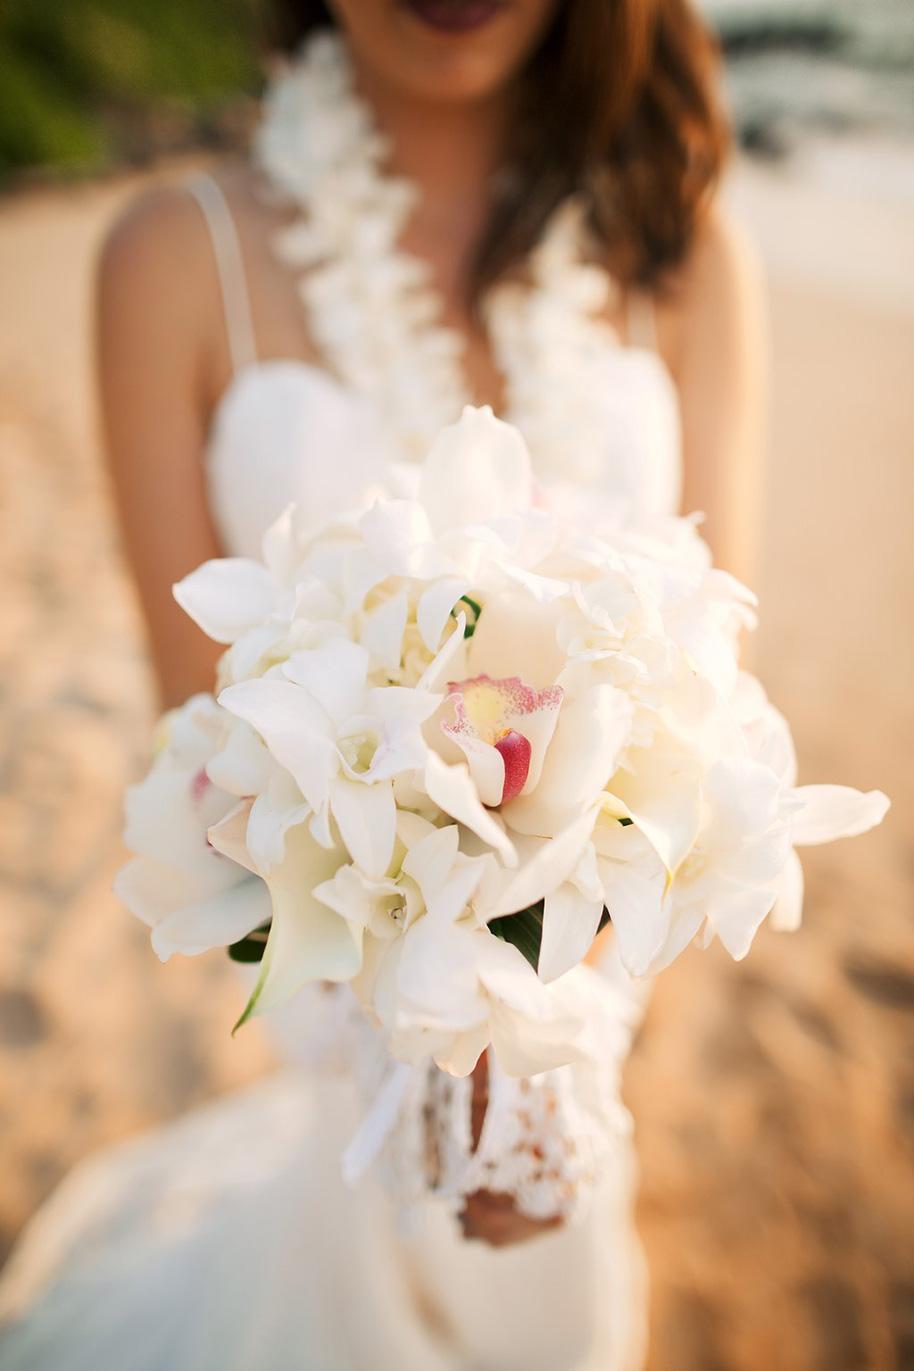 Maui-Beach-Wedding-070616-20